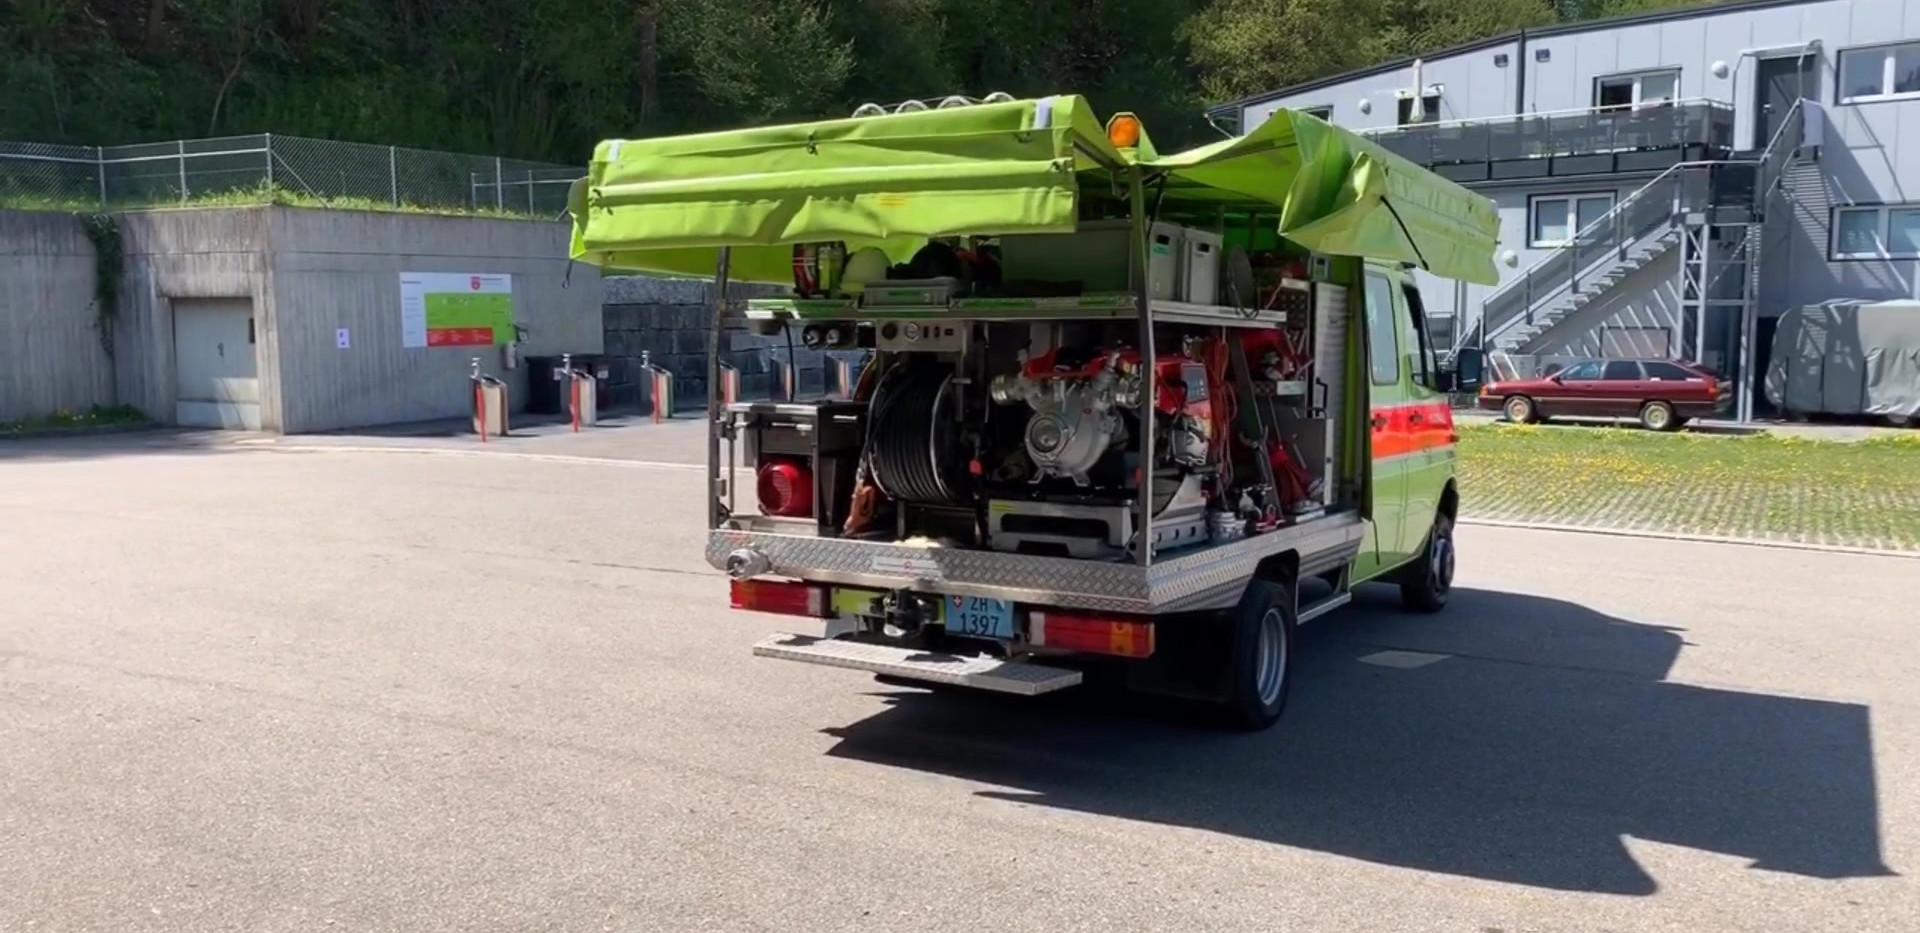 Ersteinsatzfahrzeug Wila (EEF) 360